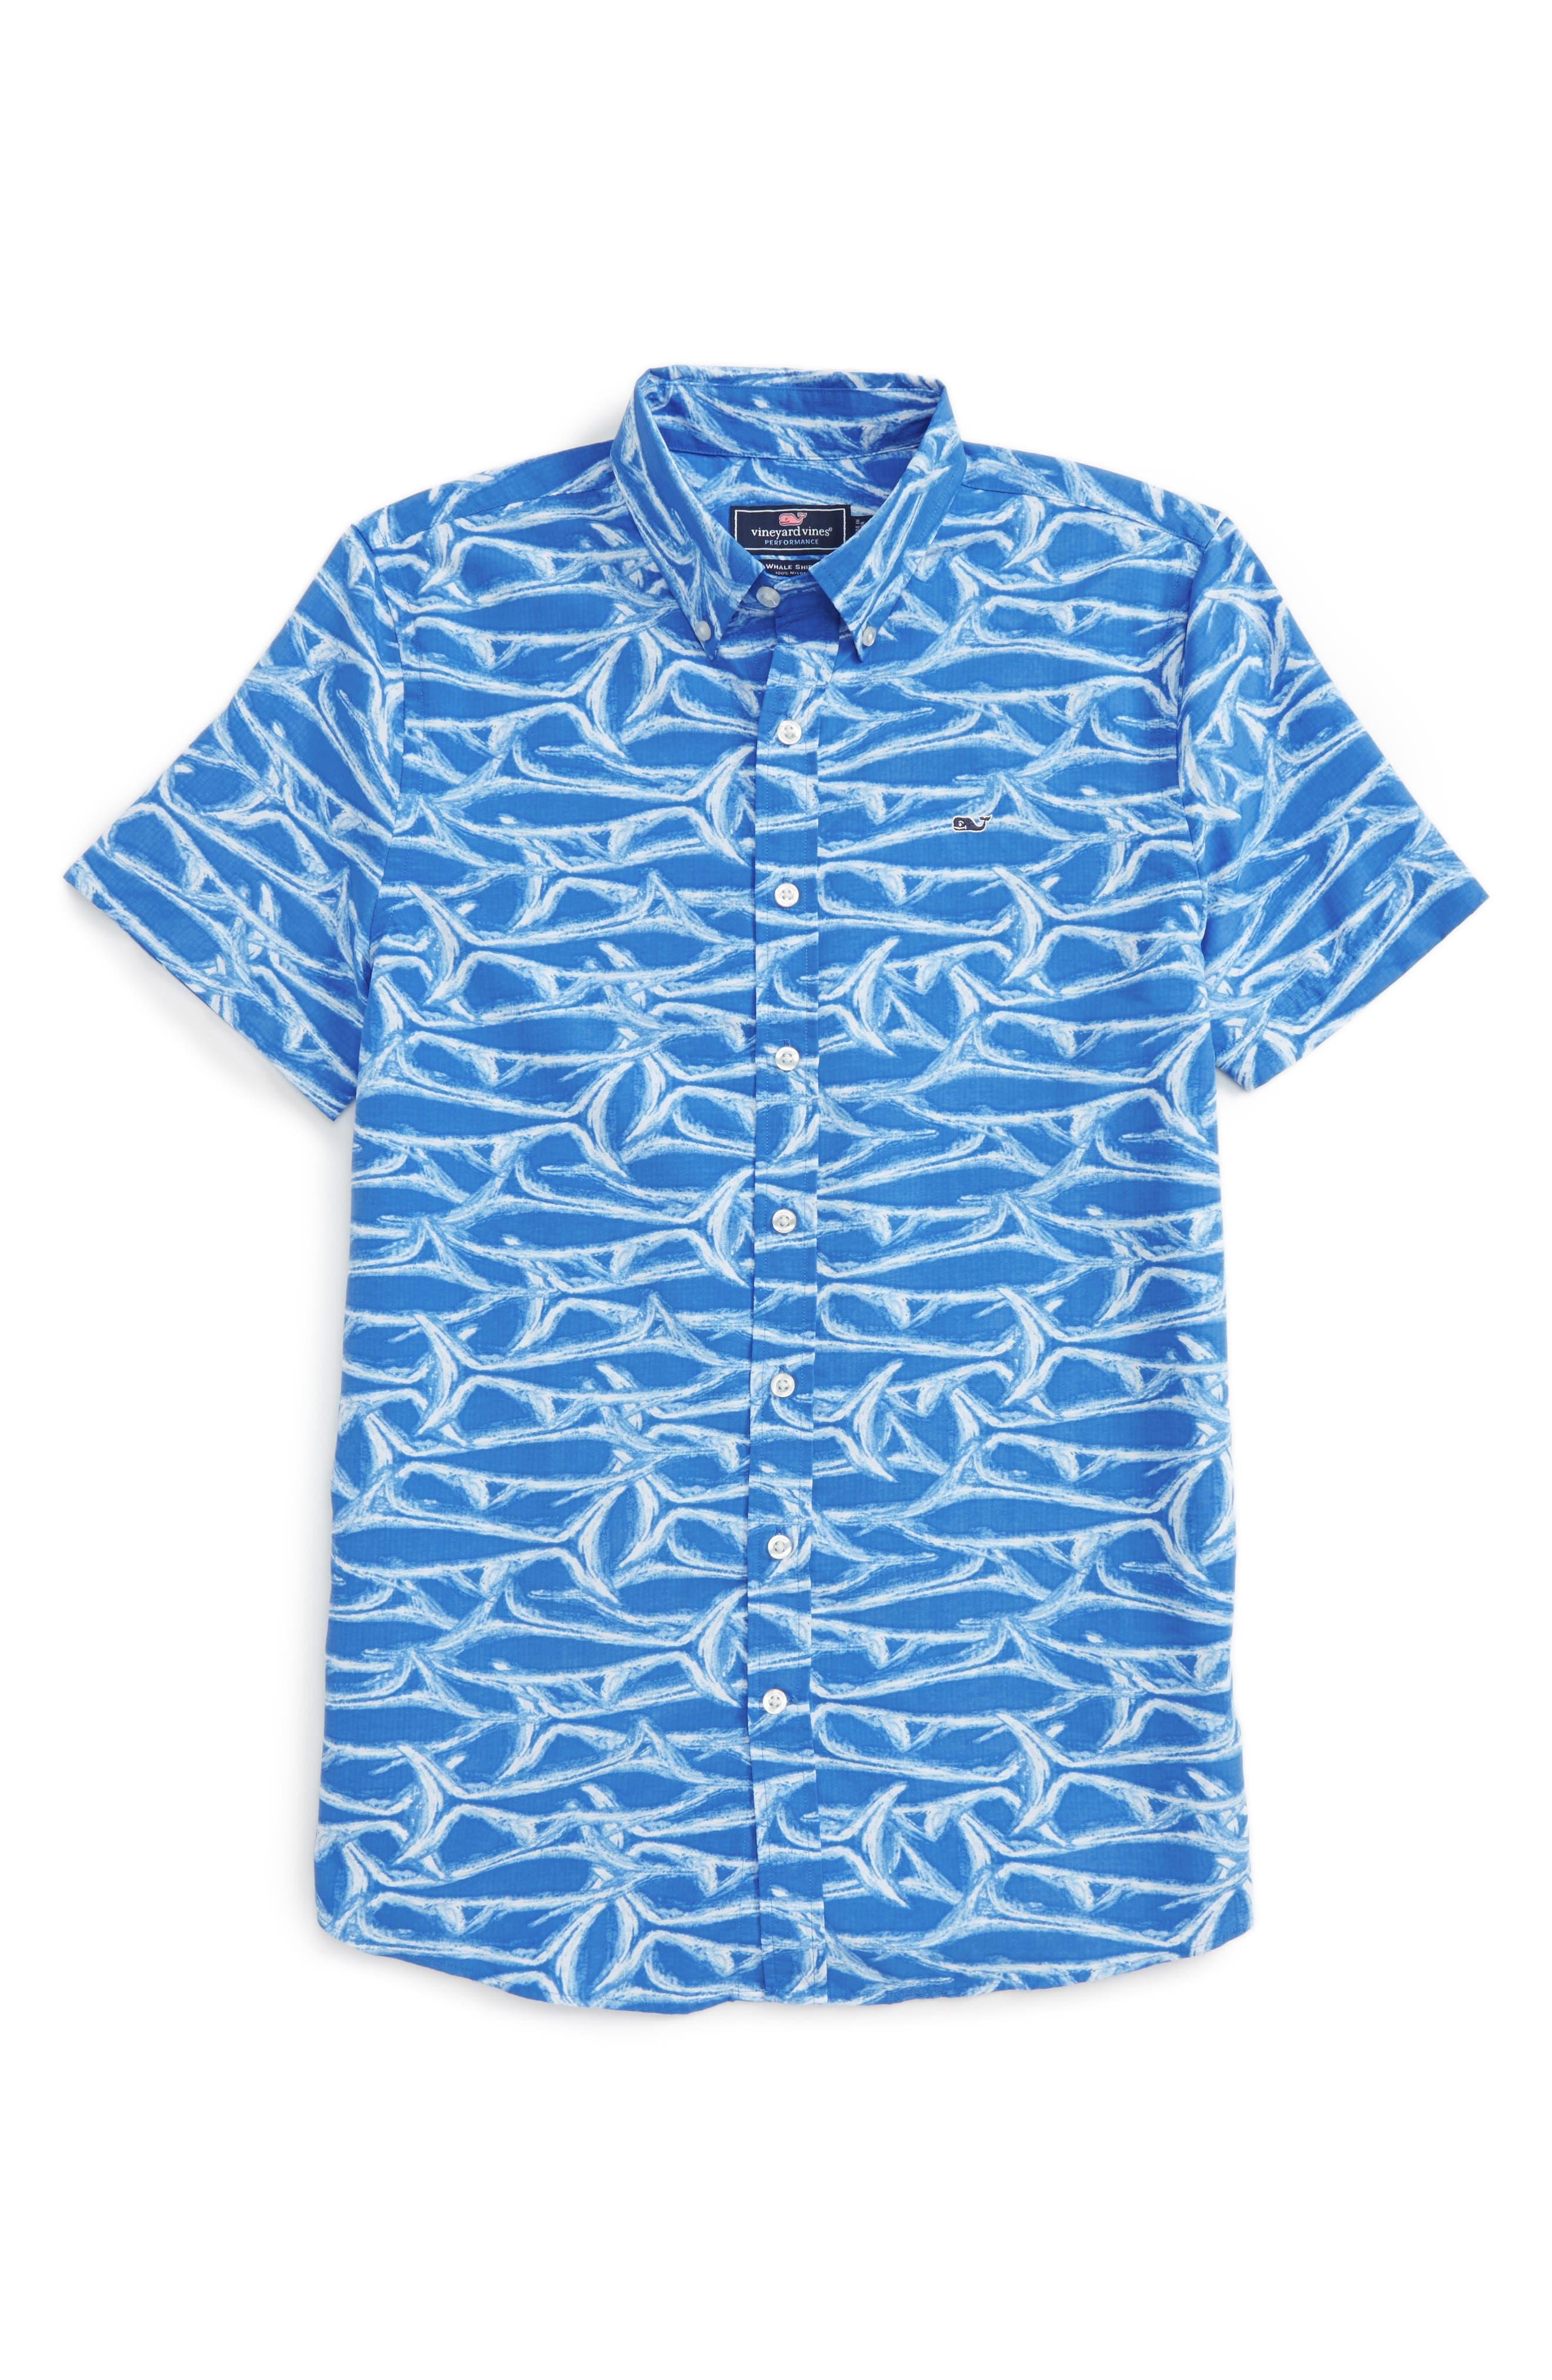 Alternate Image 1 Selected - vineyard vines Brushed Marlin Whale Shirt (Big Boys)